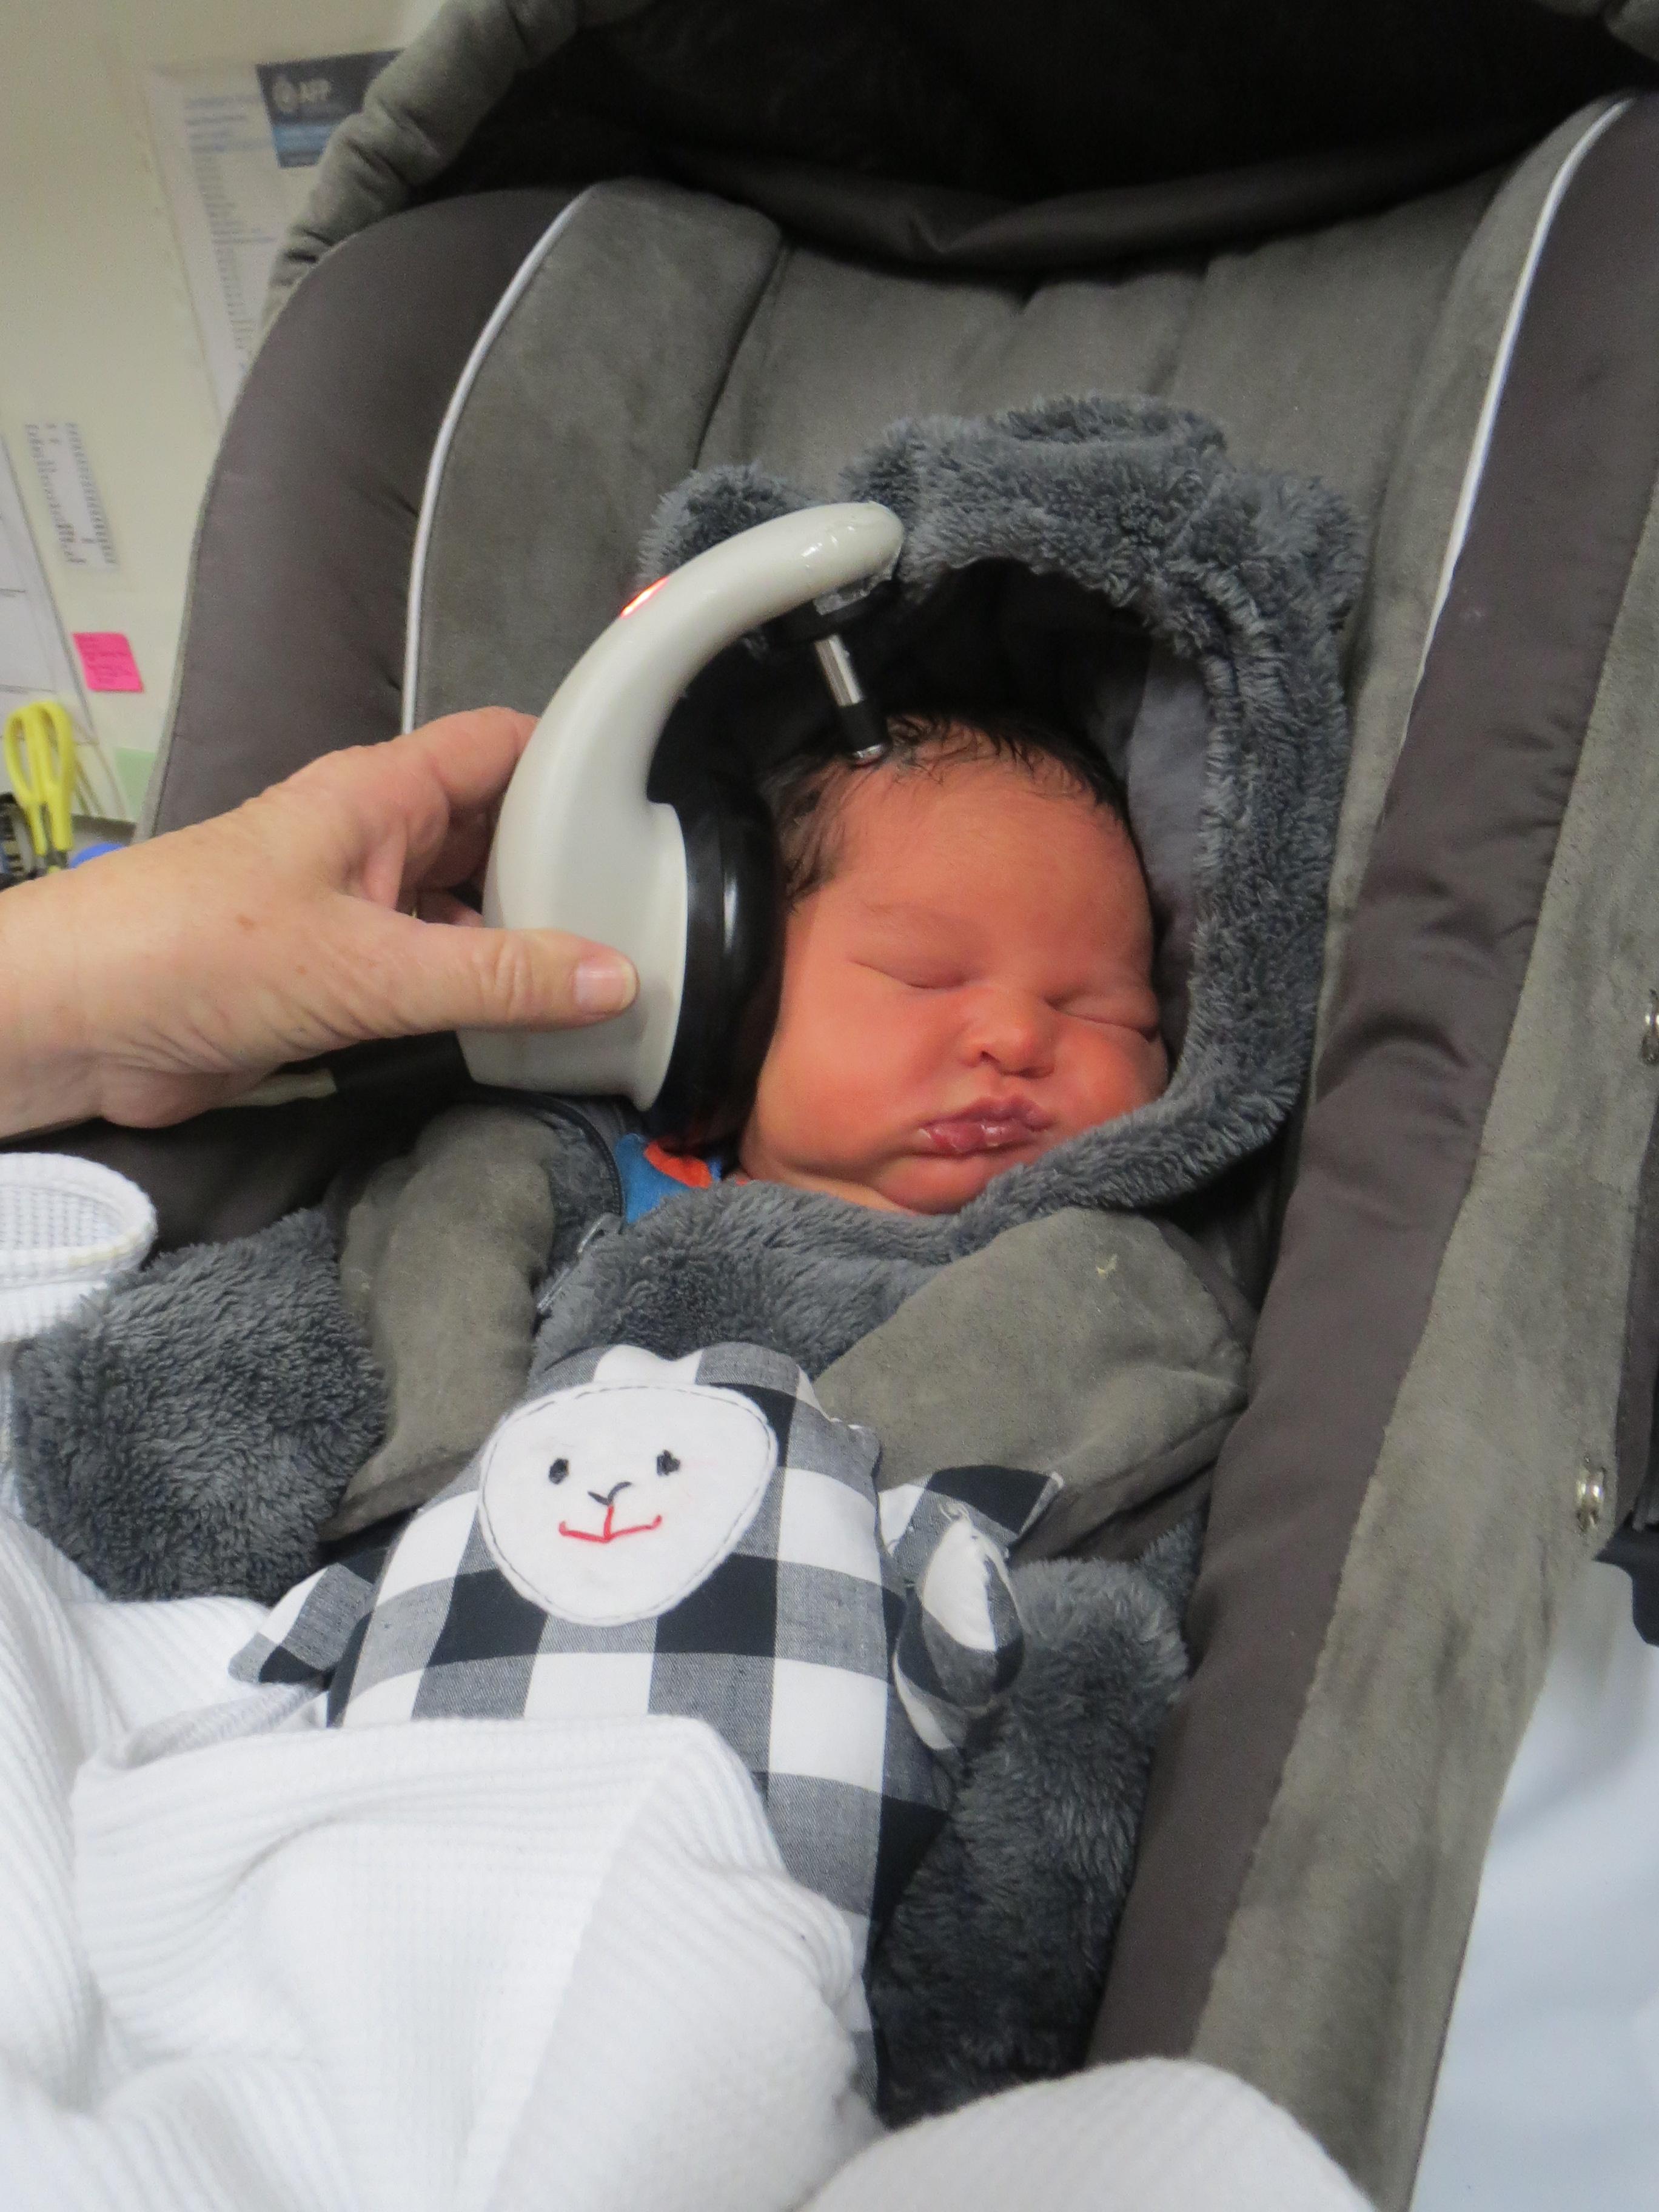 newborn hearing test (all good) for our little bear